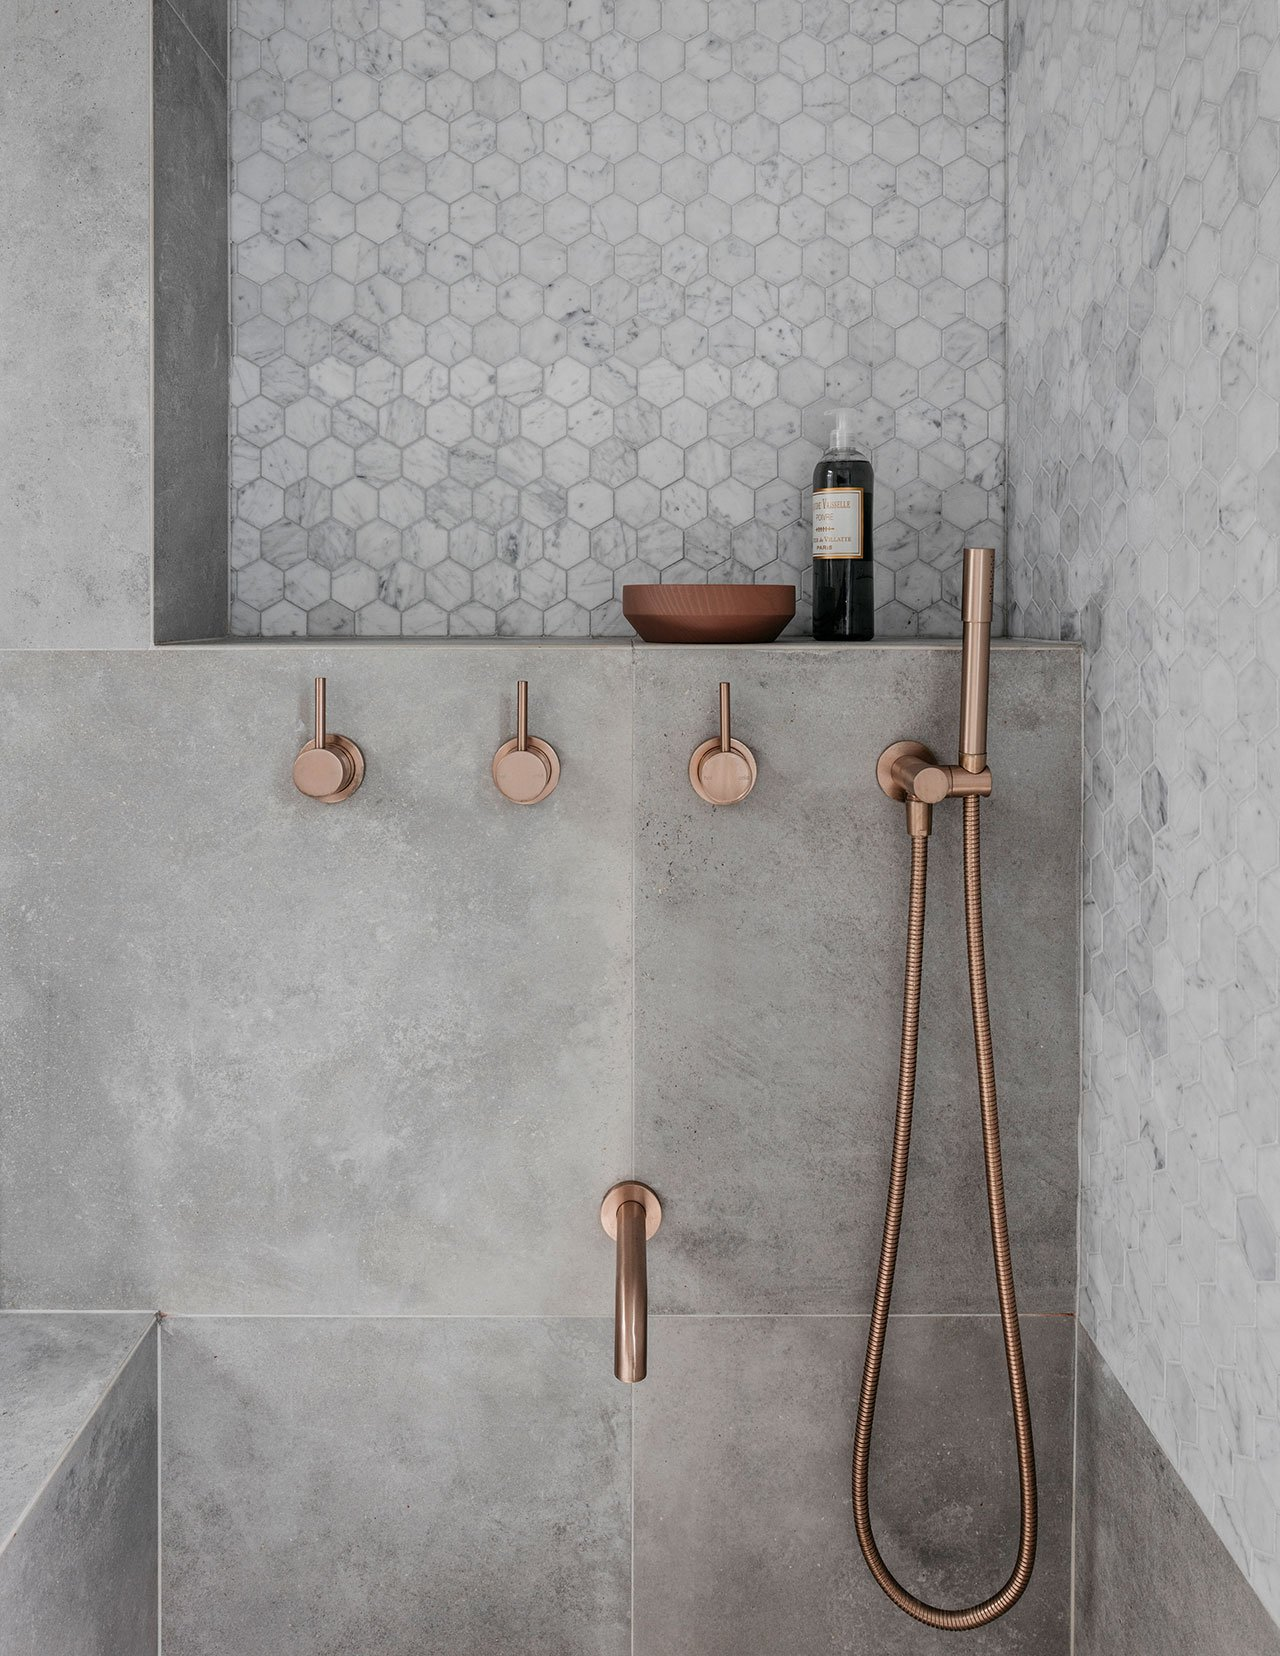 Deze mooie kleine badkamer is ontworpen met oog voor detail | HOMEASE